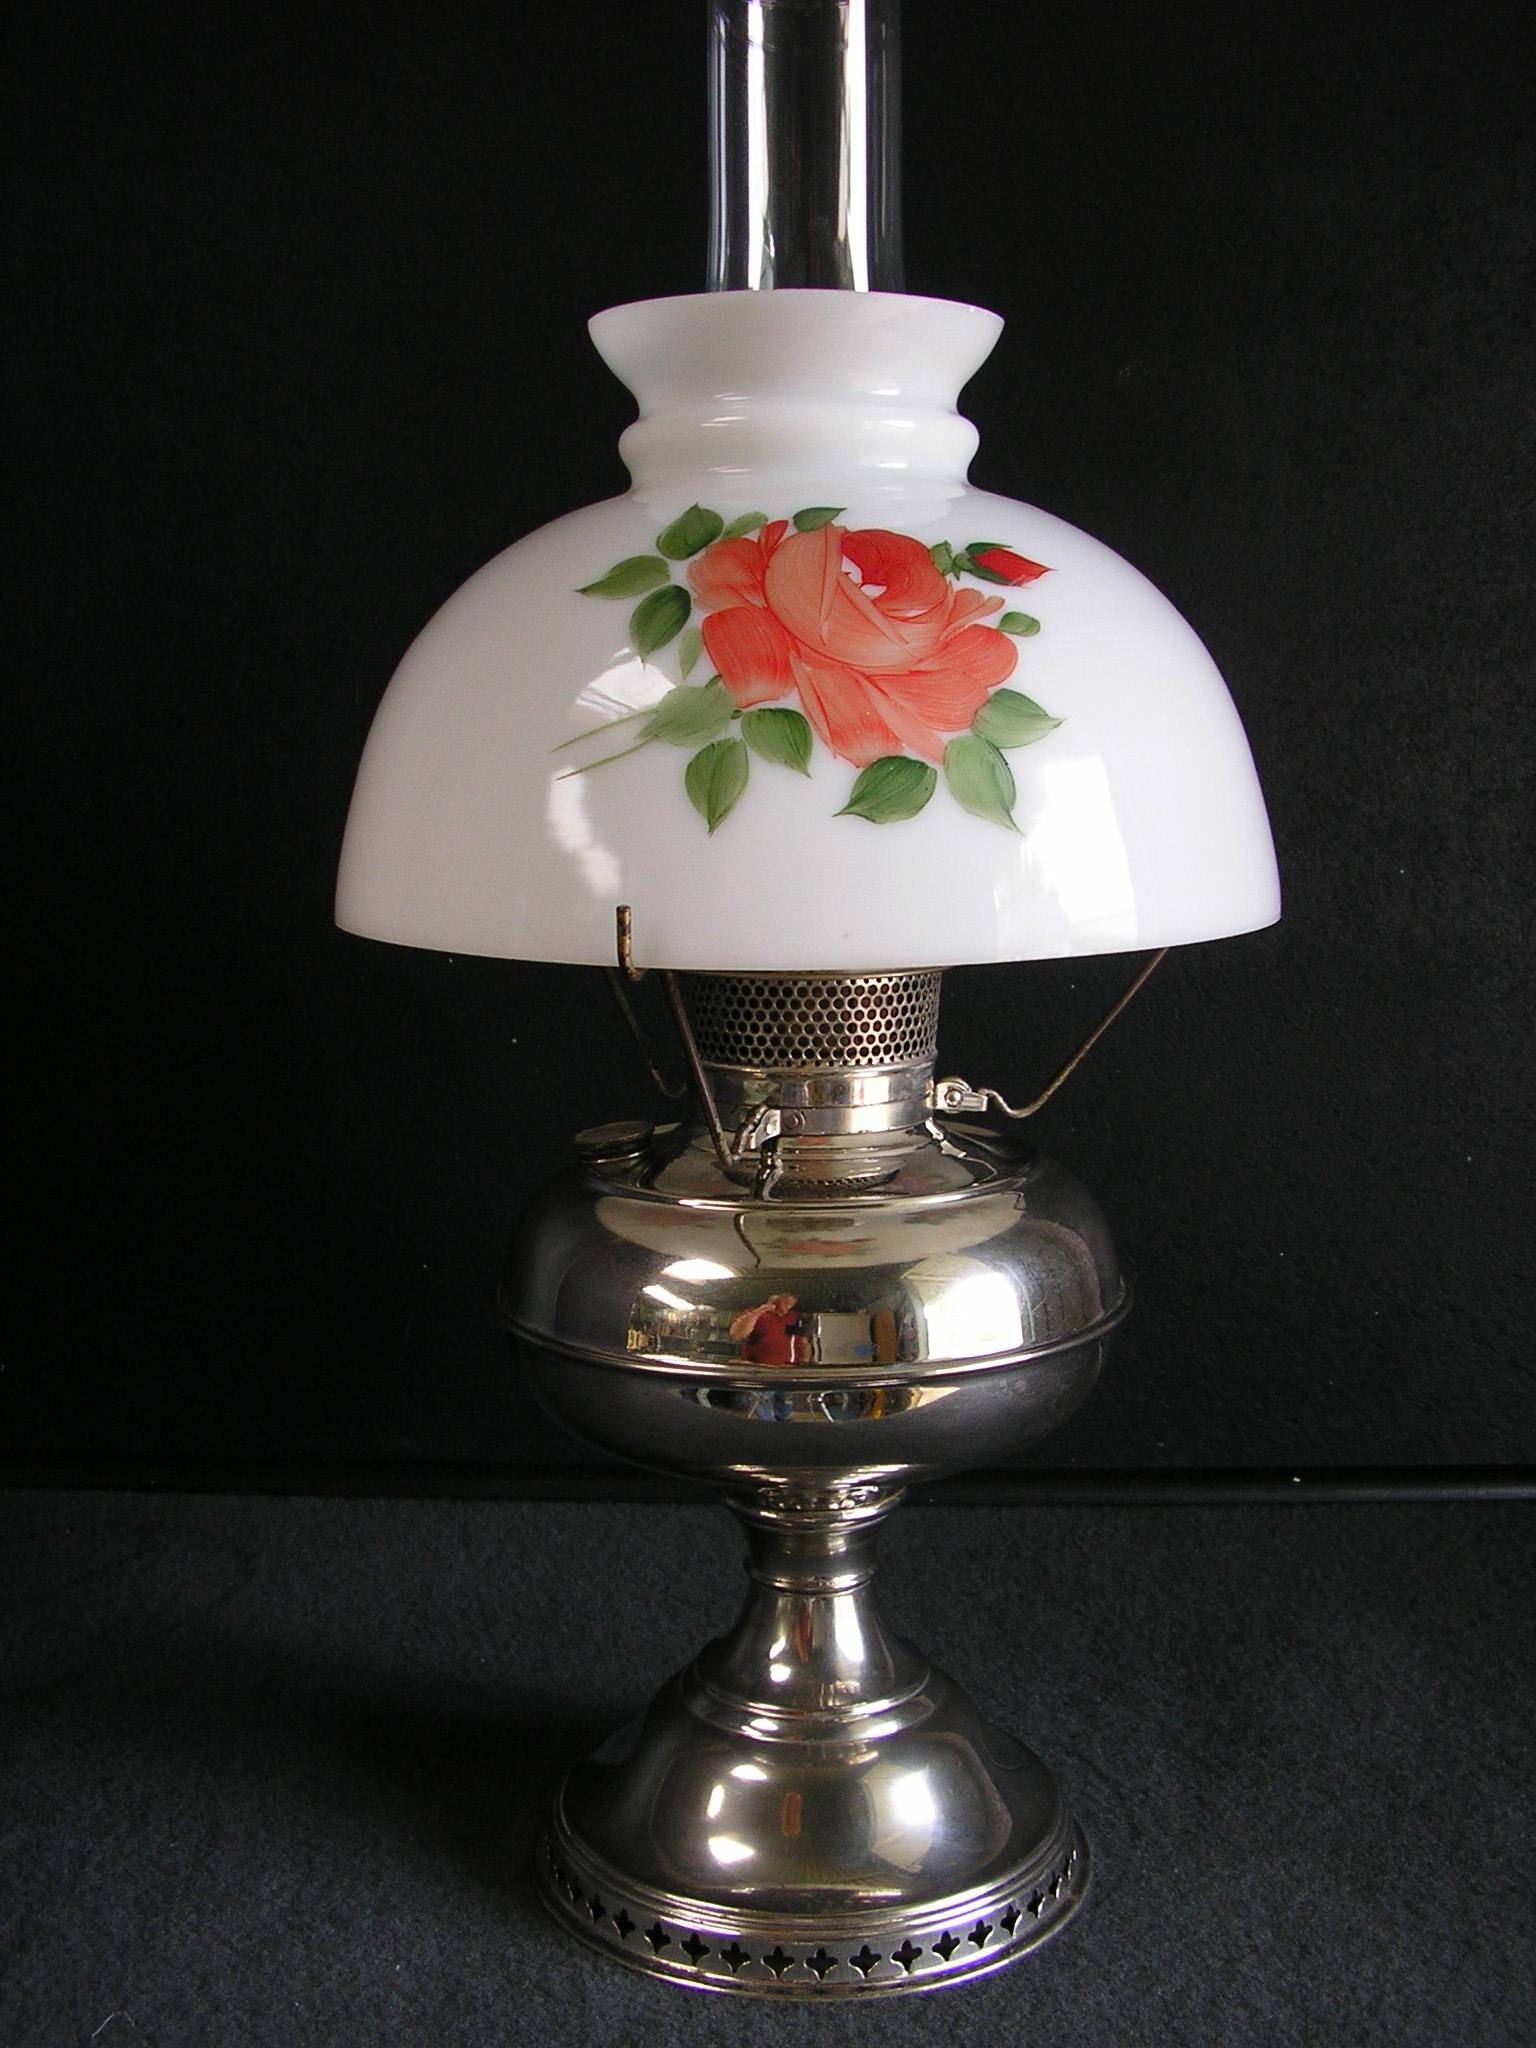 bradley hubbard lamp photo - 9